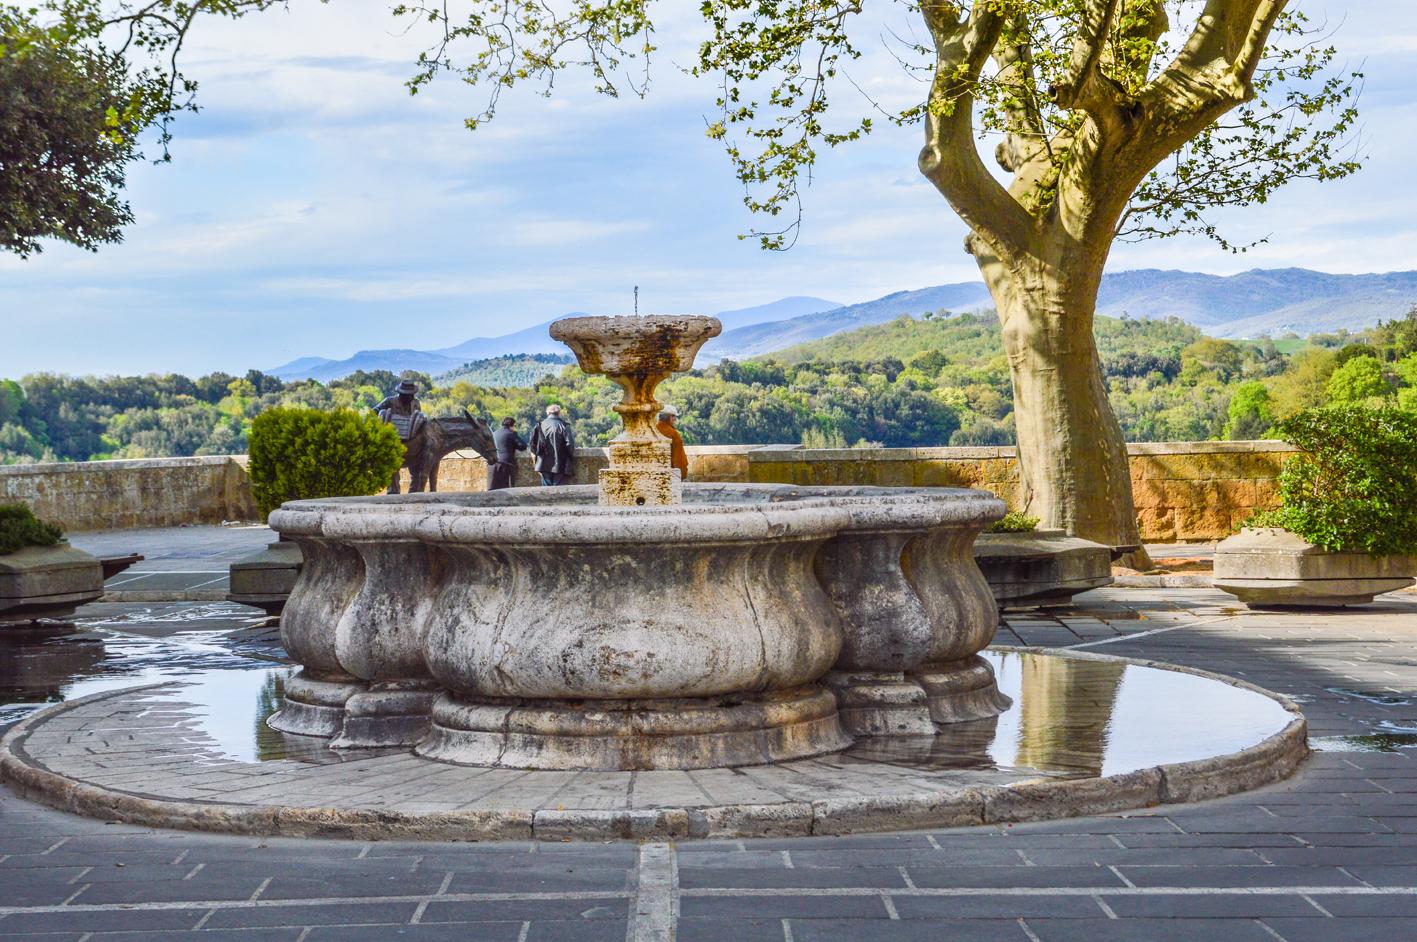 84 #WhereToGo: Pitigliano (Toscana)